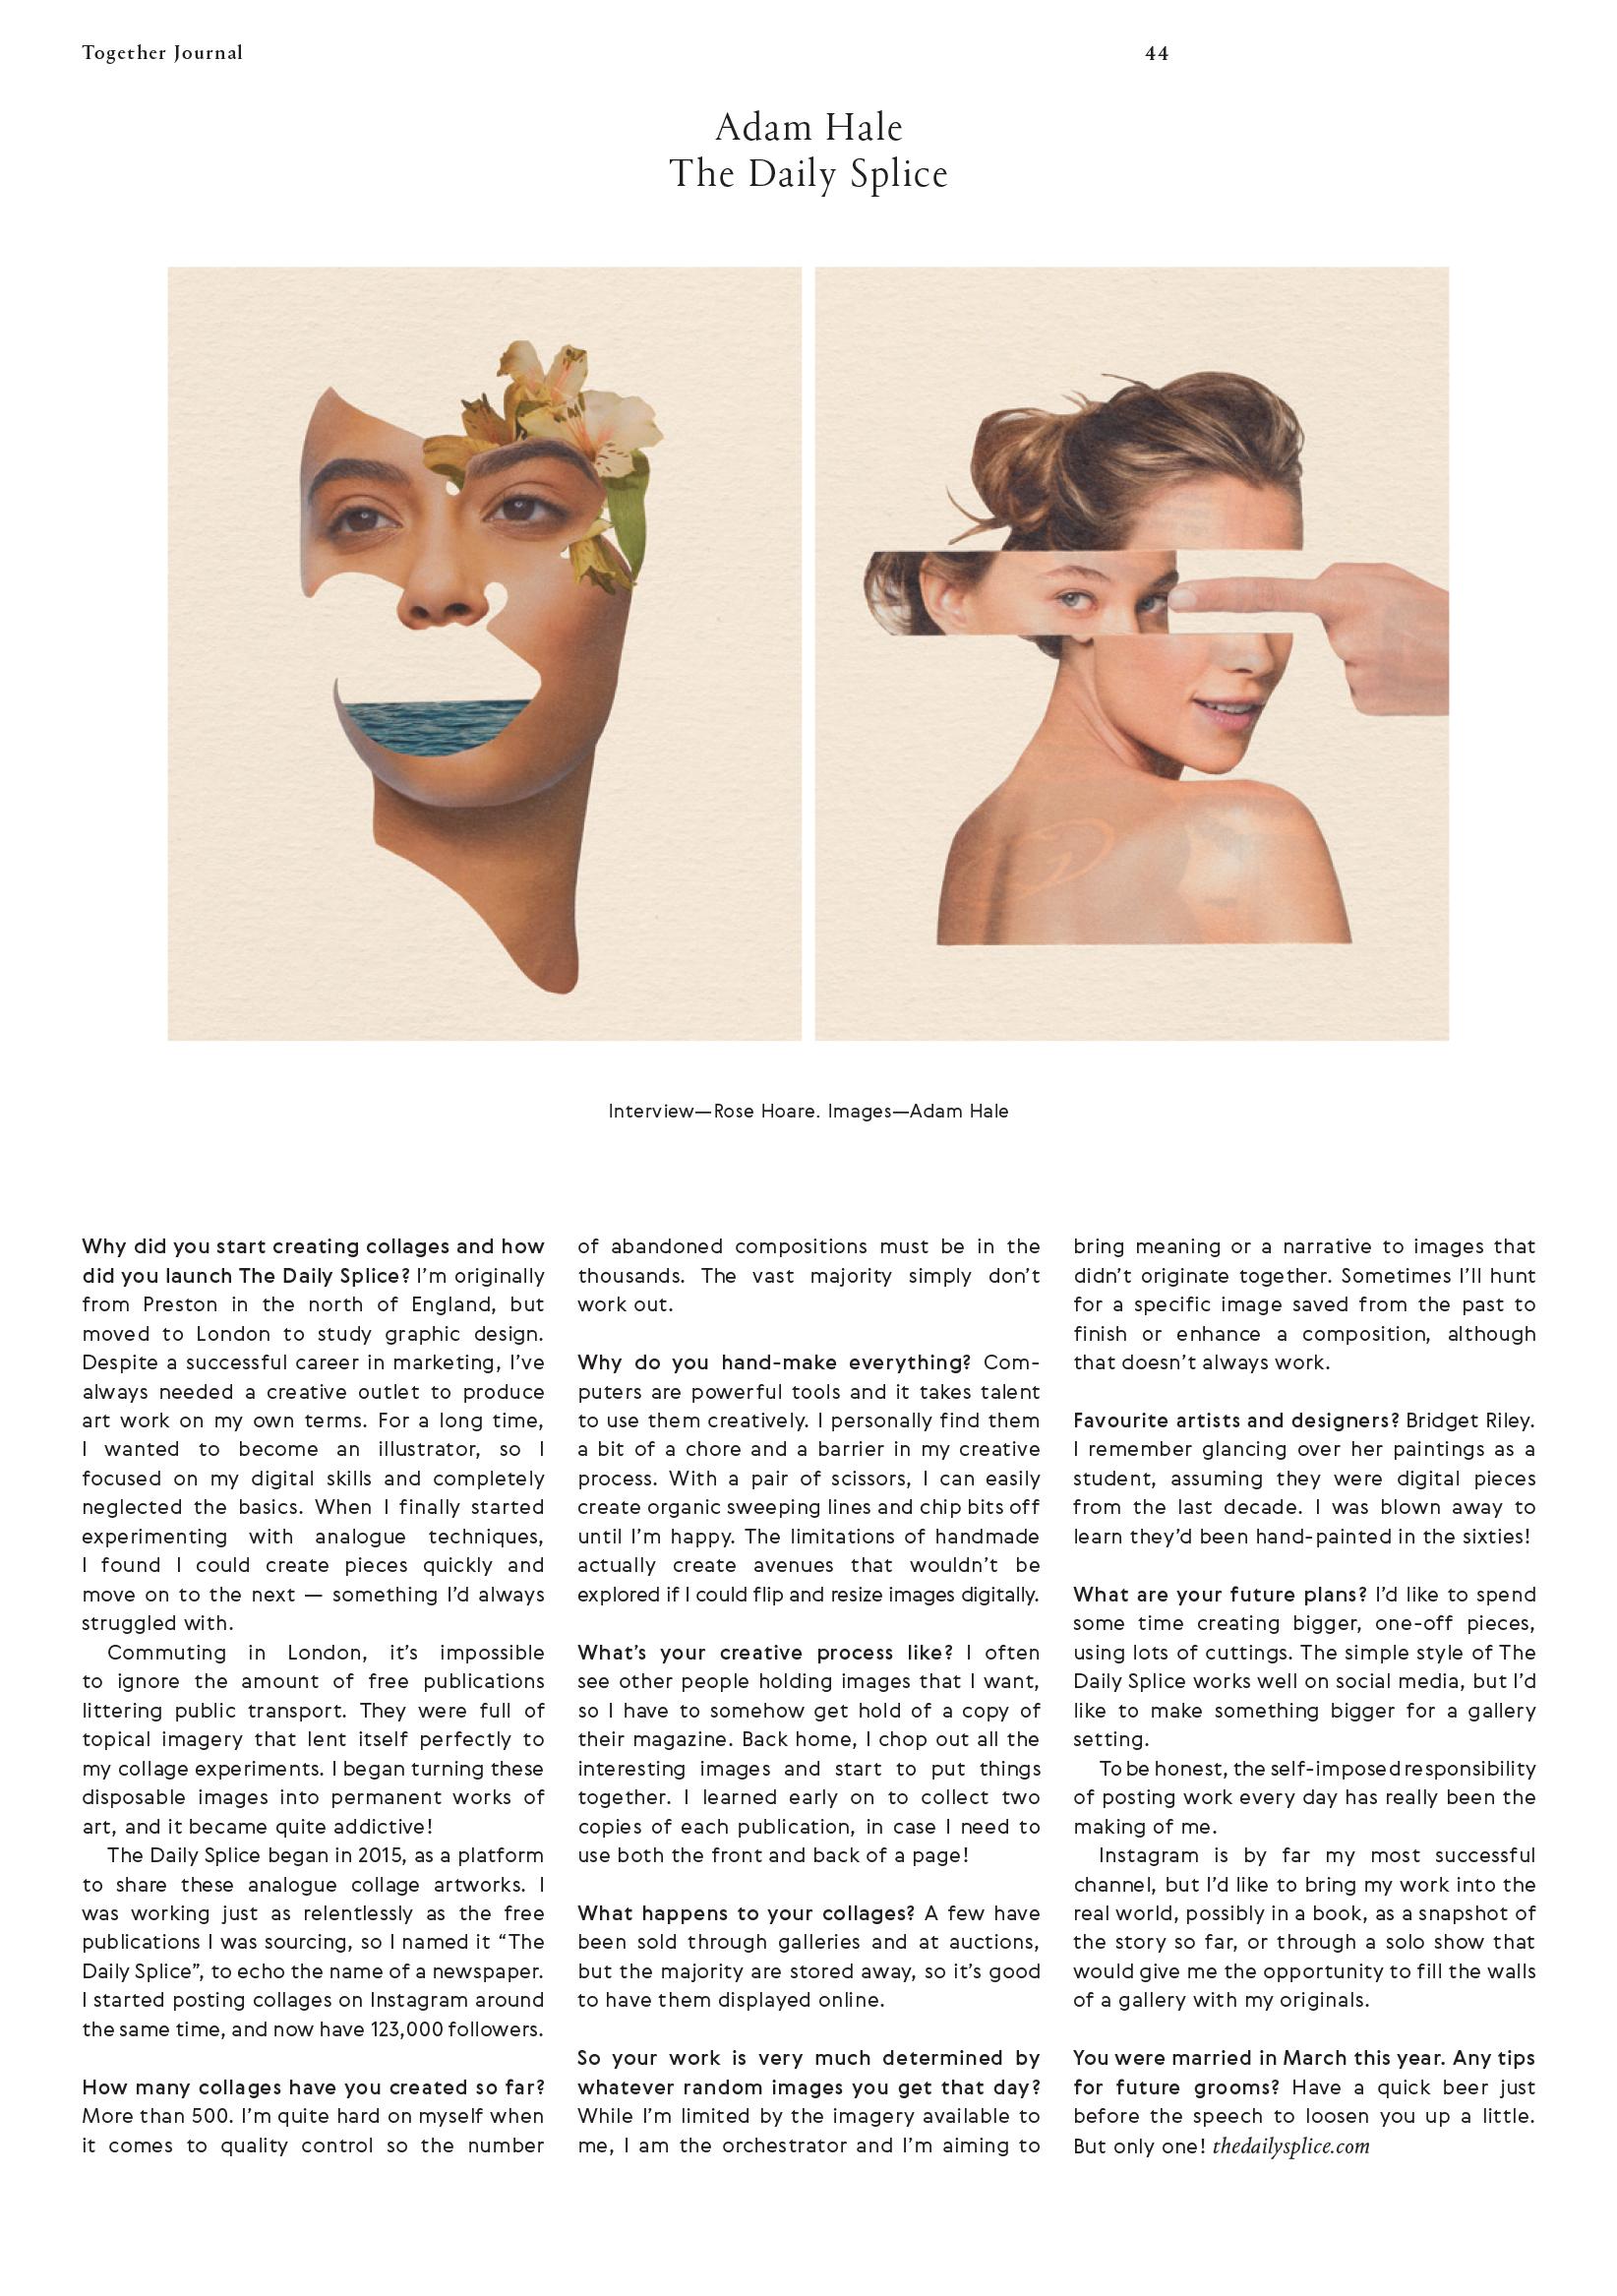 TJ5_044-045_Profile_Adam Hale.pdf